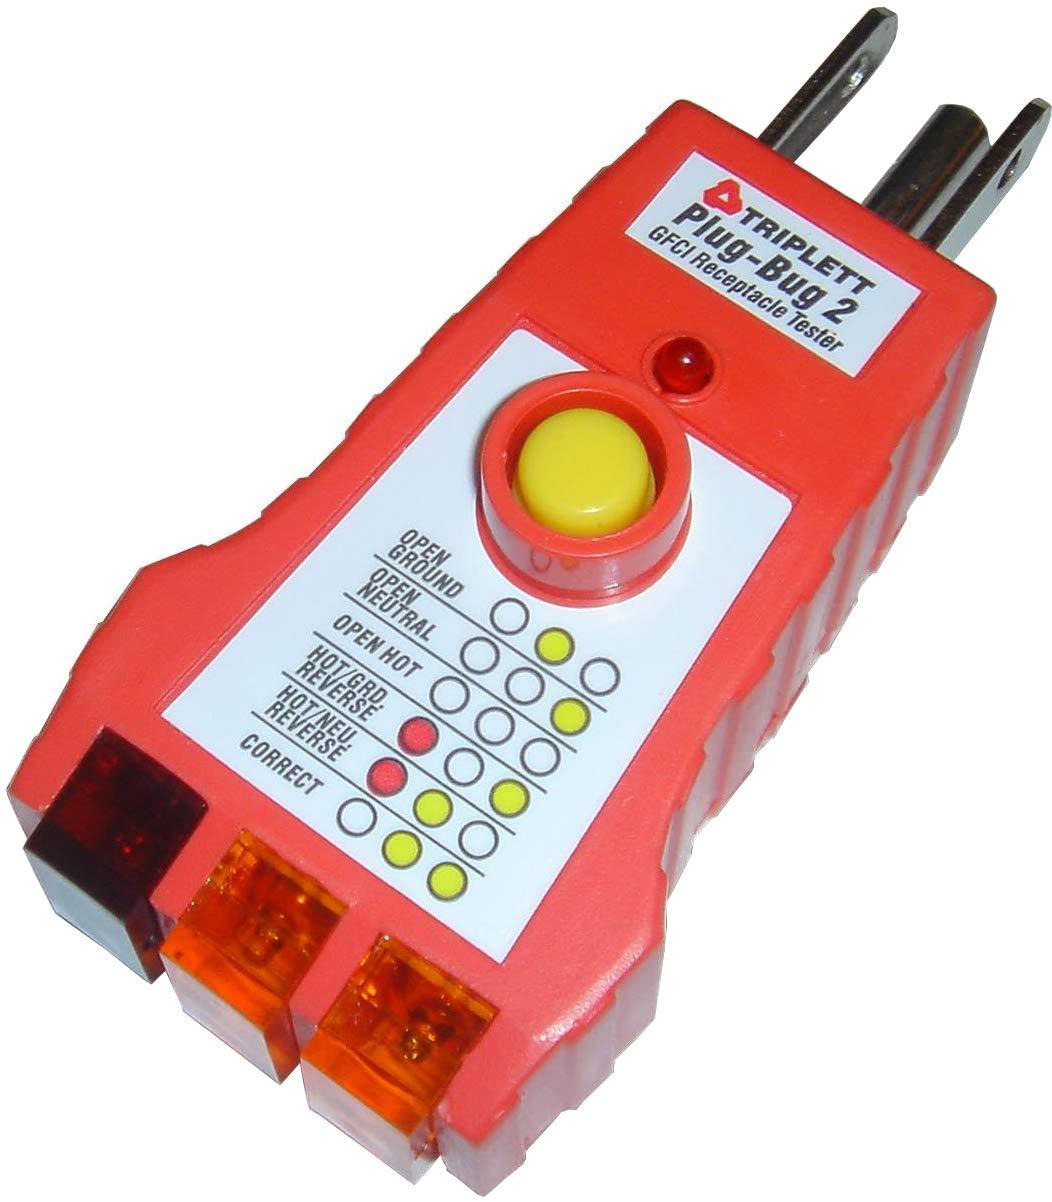 Triplett Plug-Bug 2 GFCI Outlet Tester - Works on 110 ~ 125 VAC Receptacles (9610)